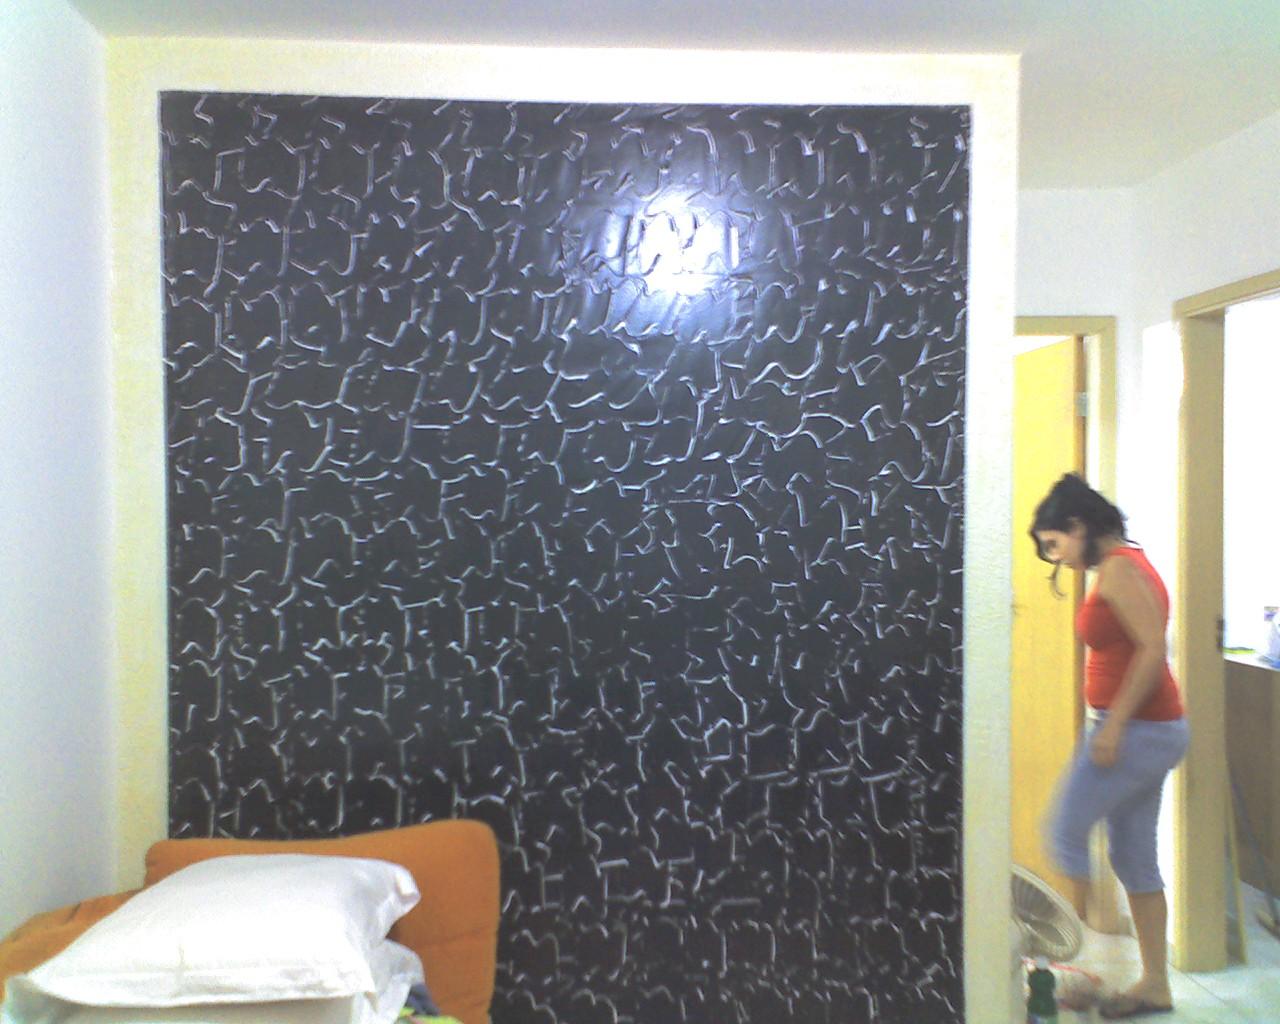 Pinthar pinturas decorativas pinturas decorativas - Pintura decorativa paredes ...